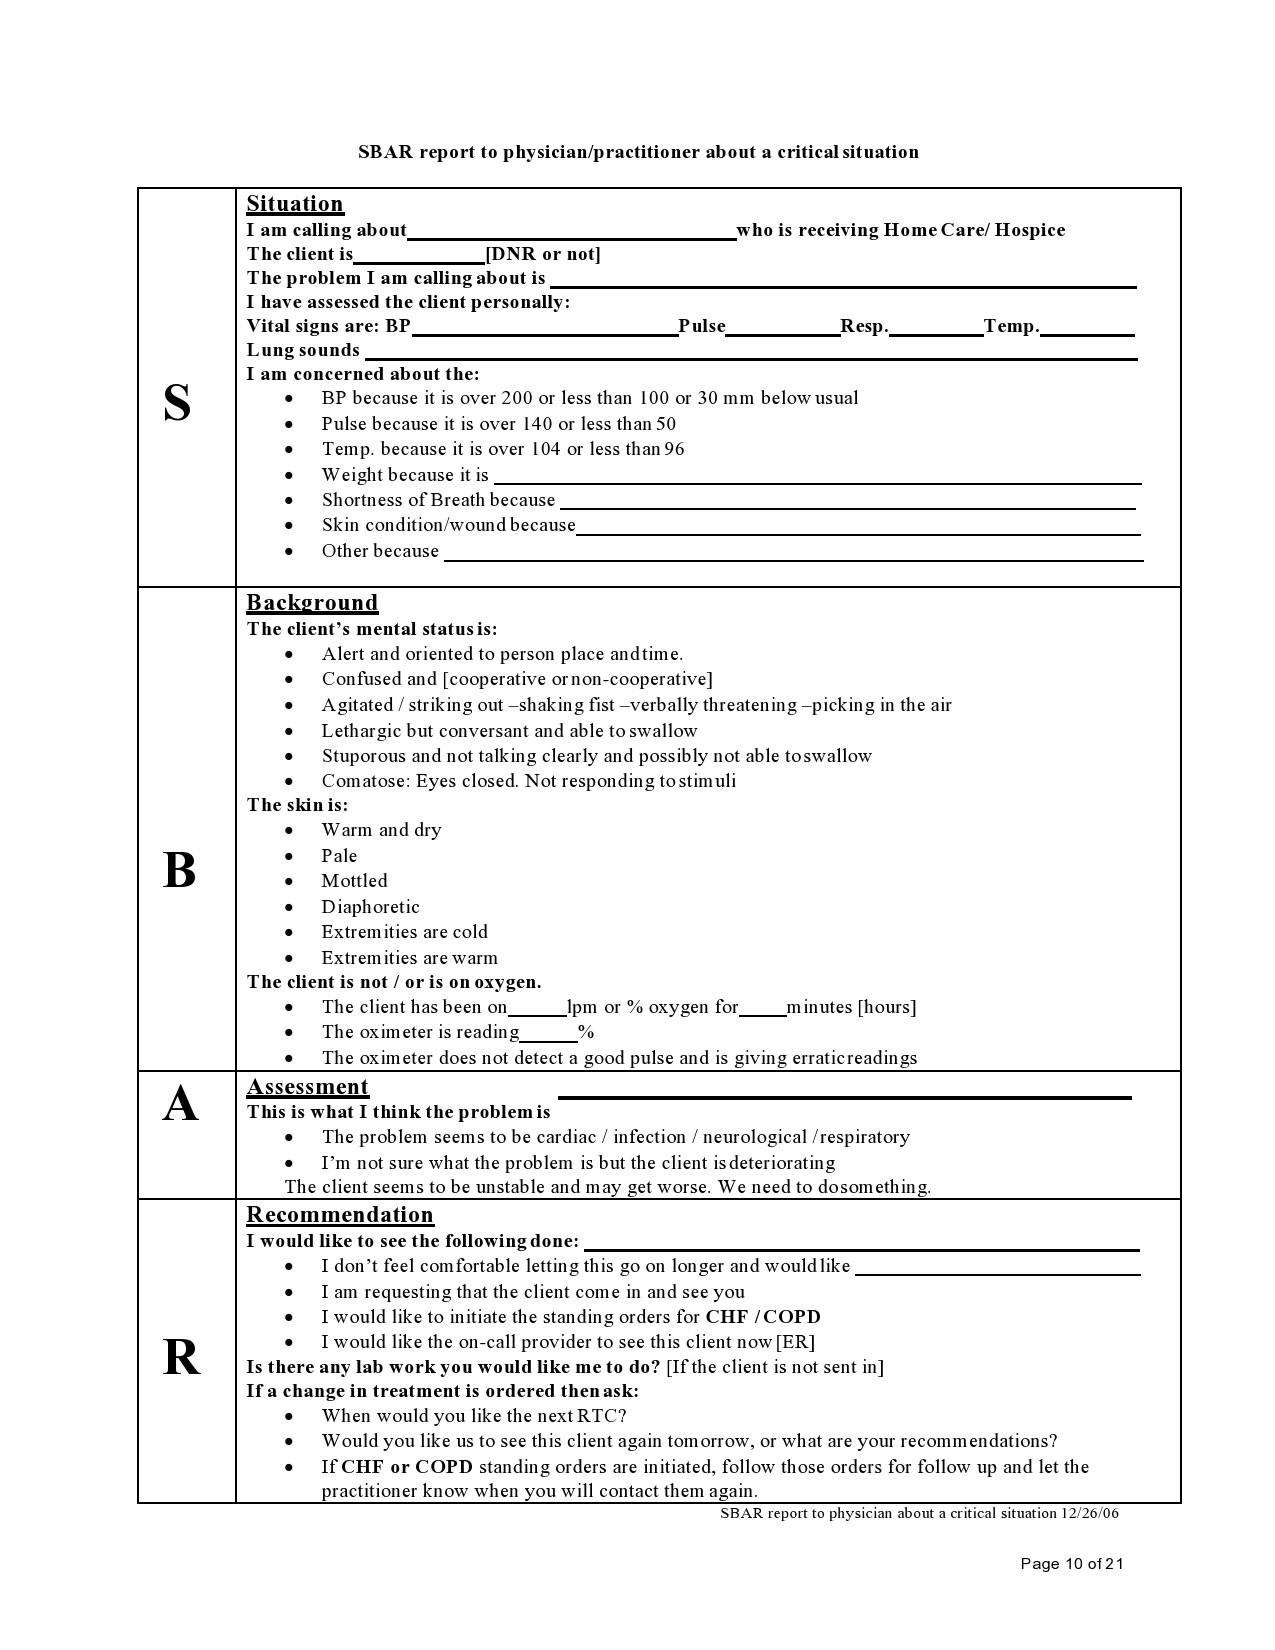 Free sbar template 40